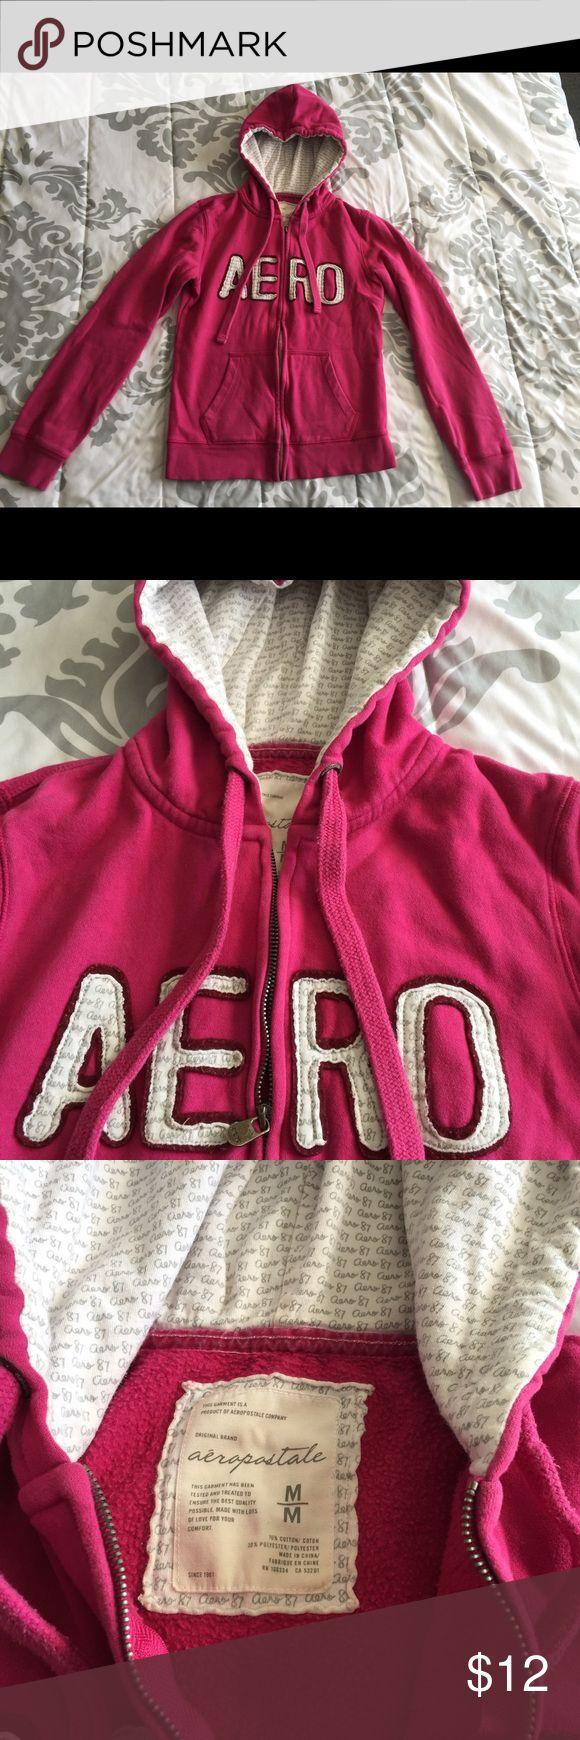 Pink Aeropostale zip up hoodie MEDIUM. Aeropostale pink zip up hoodie size medium. No rips, tears, or stains, pet and smoke free home. No trades ! Aeropostale Tops Sweatshirts & Hoodies